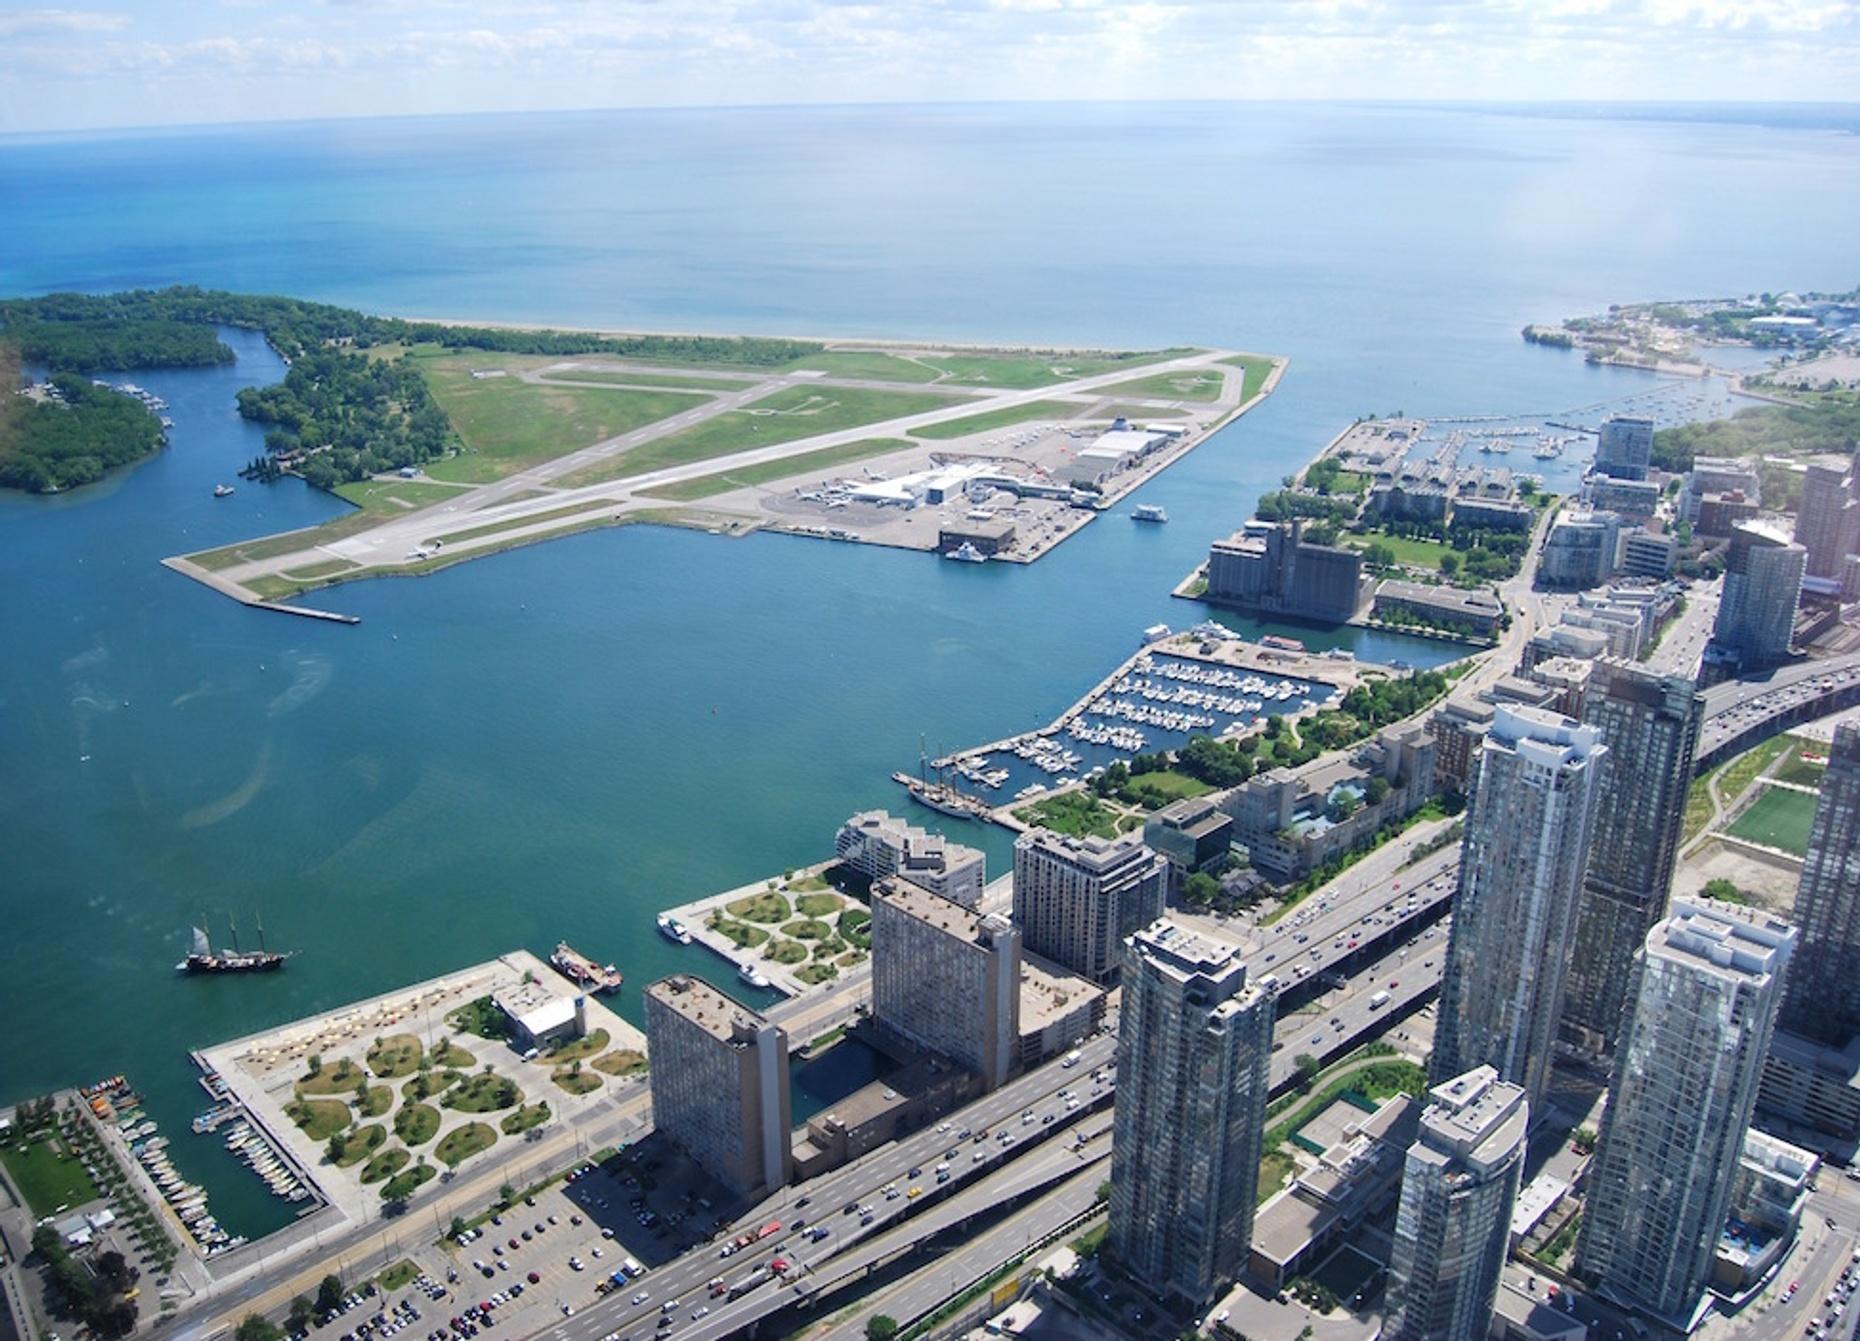 Executive Flight from Toronto Island to Niagara District